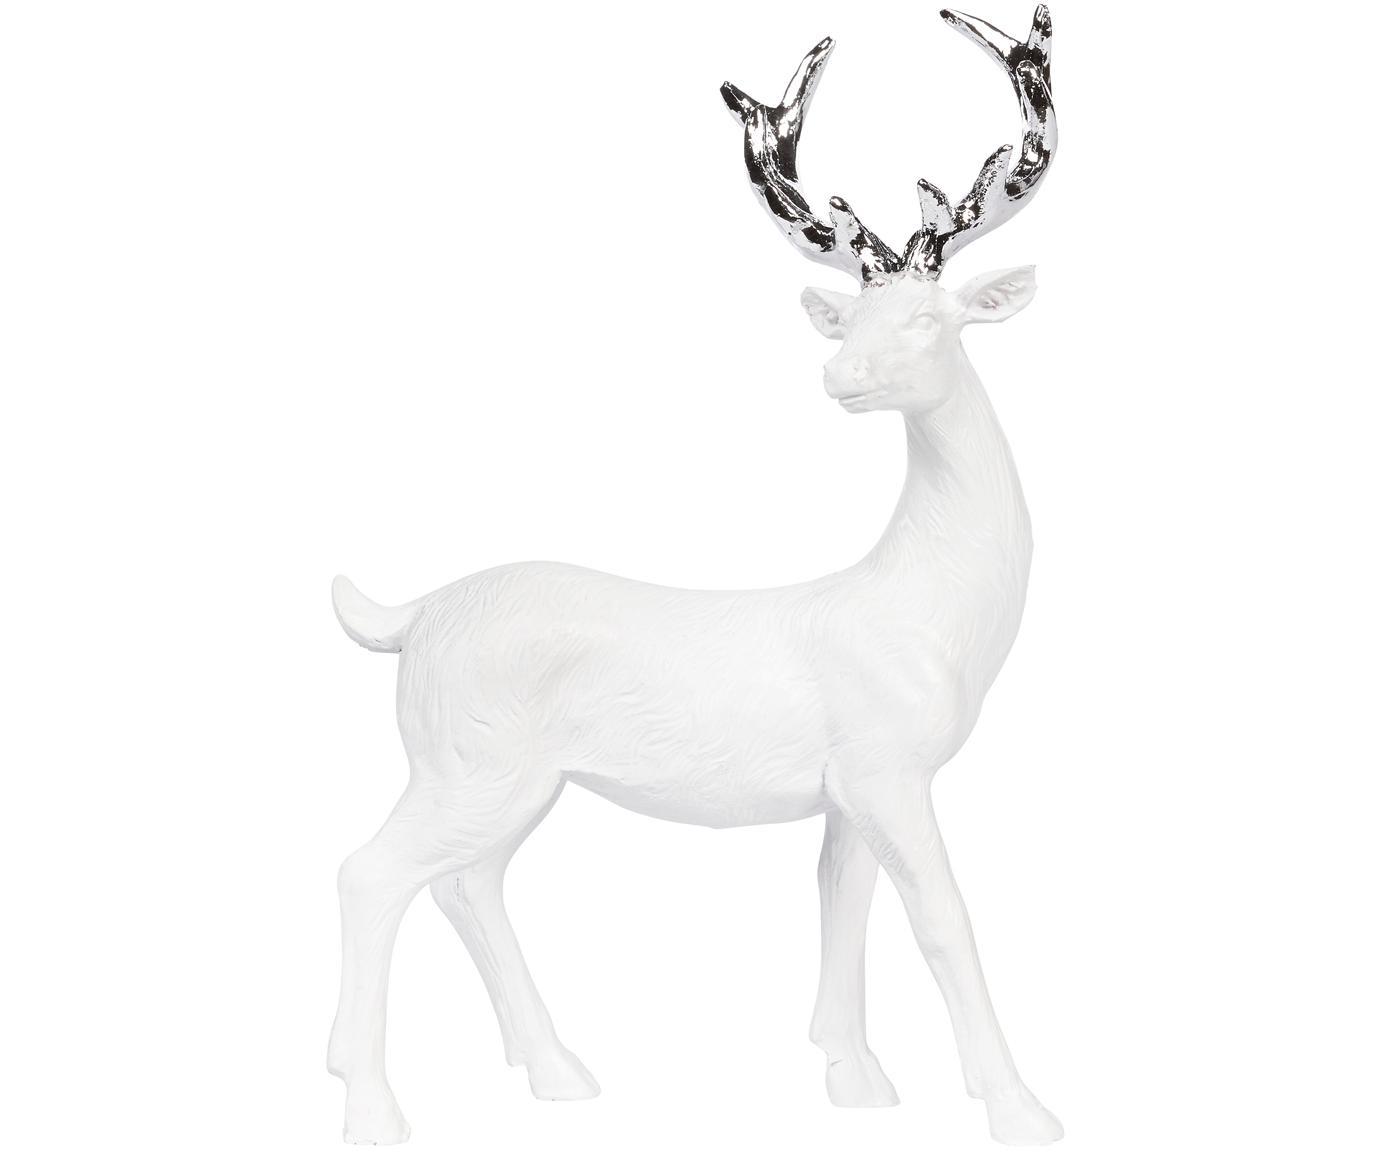 Handgefertigtes Deko-Objekt Deer, Polyresin, Weiss, Silberfarben, 9 x 14 cm